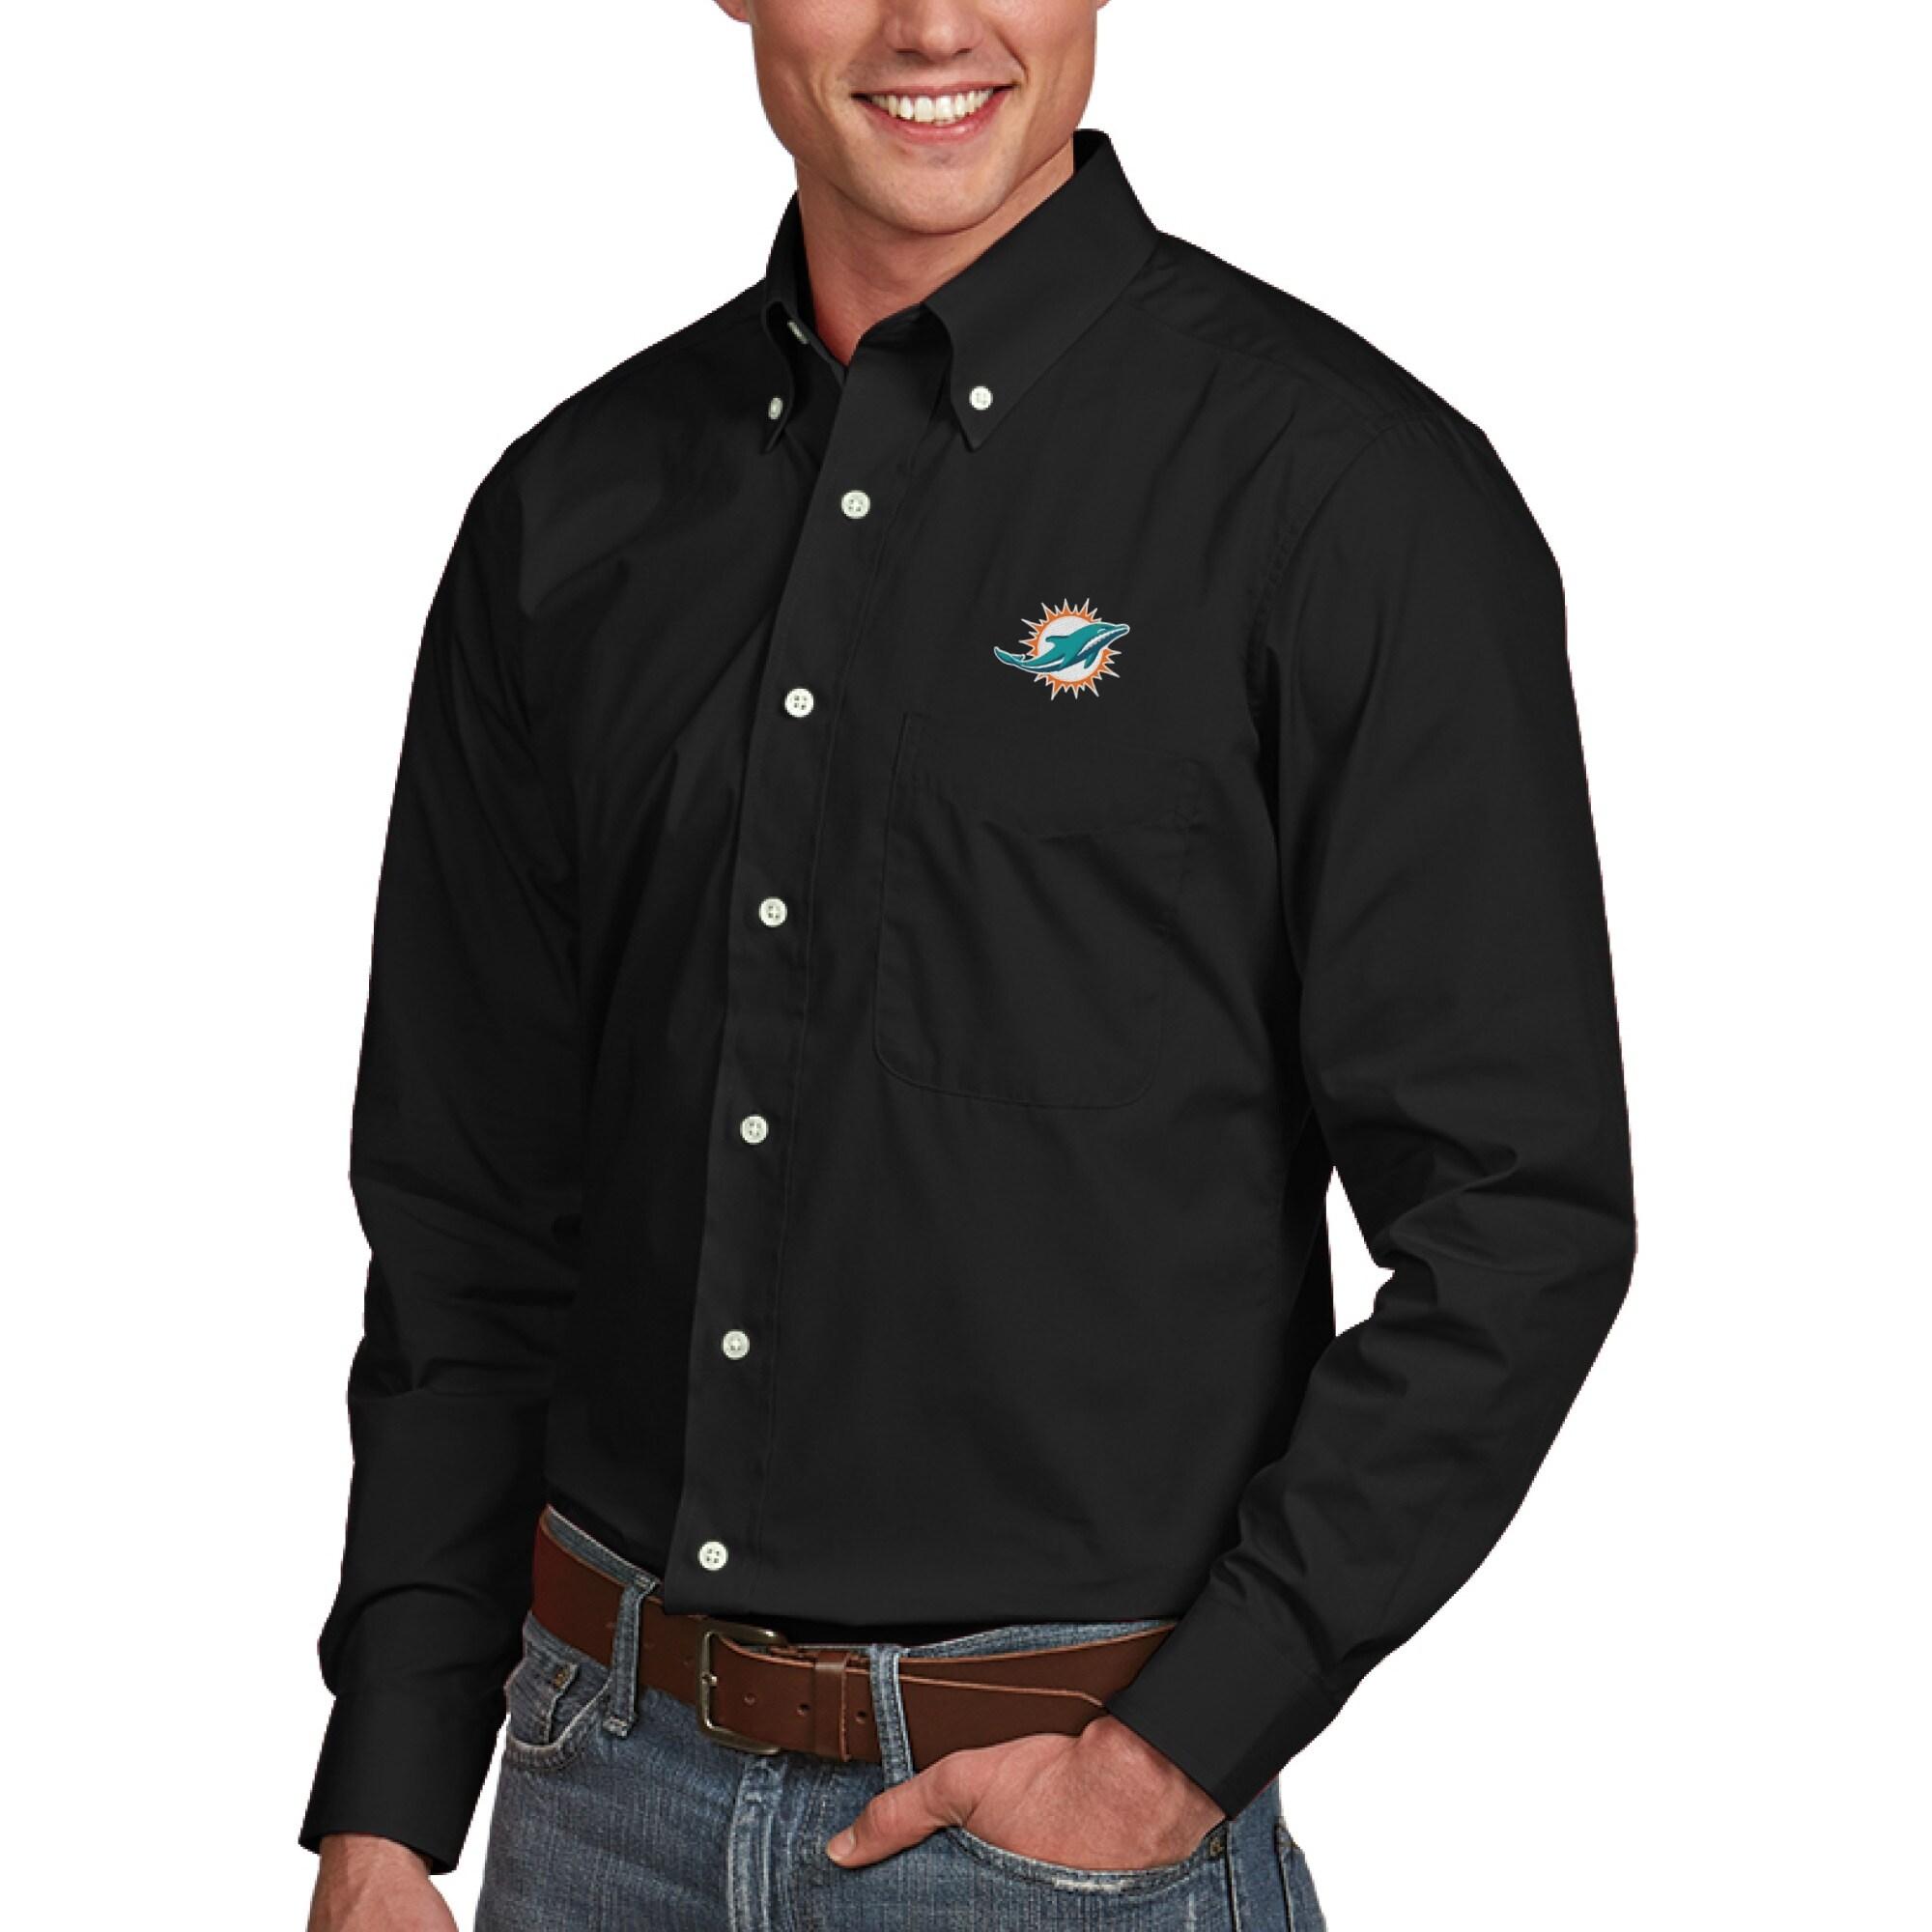 Miami Dolphins Antigua Dynasty Woven Long Sleeve Shirt - Black